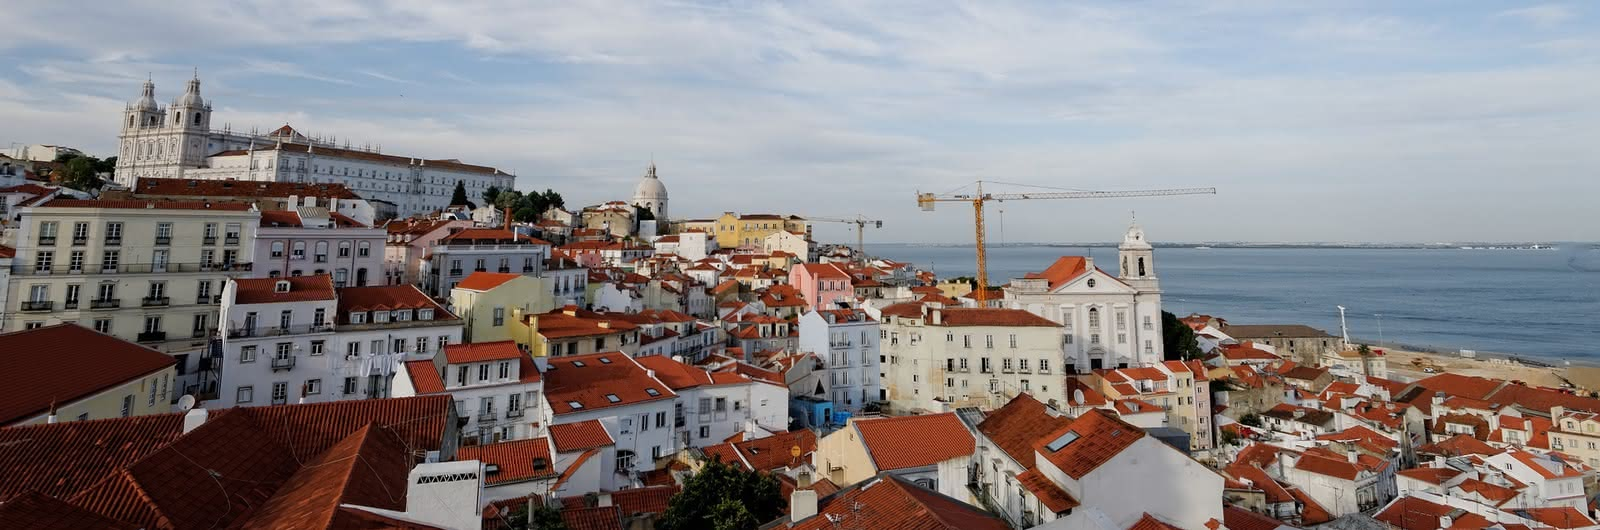 lisbon city header